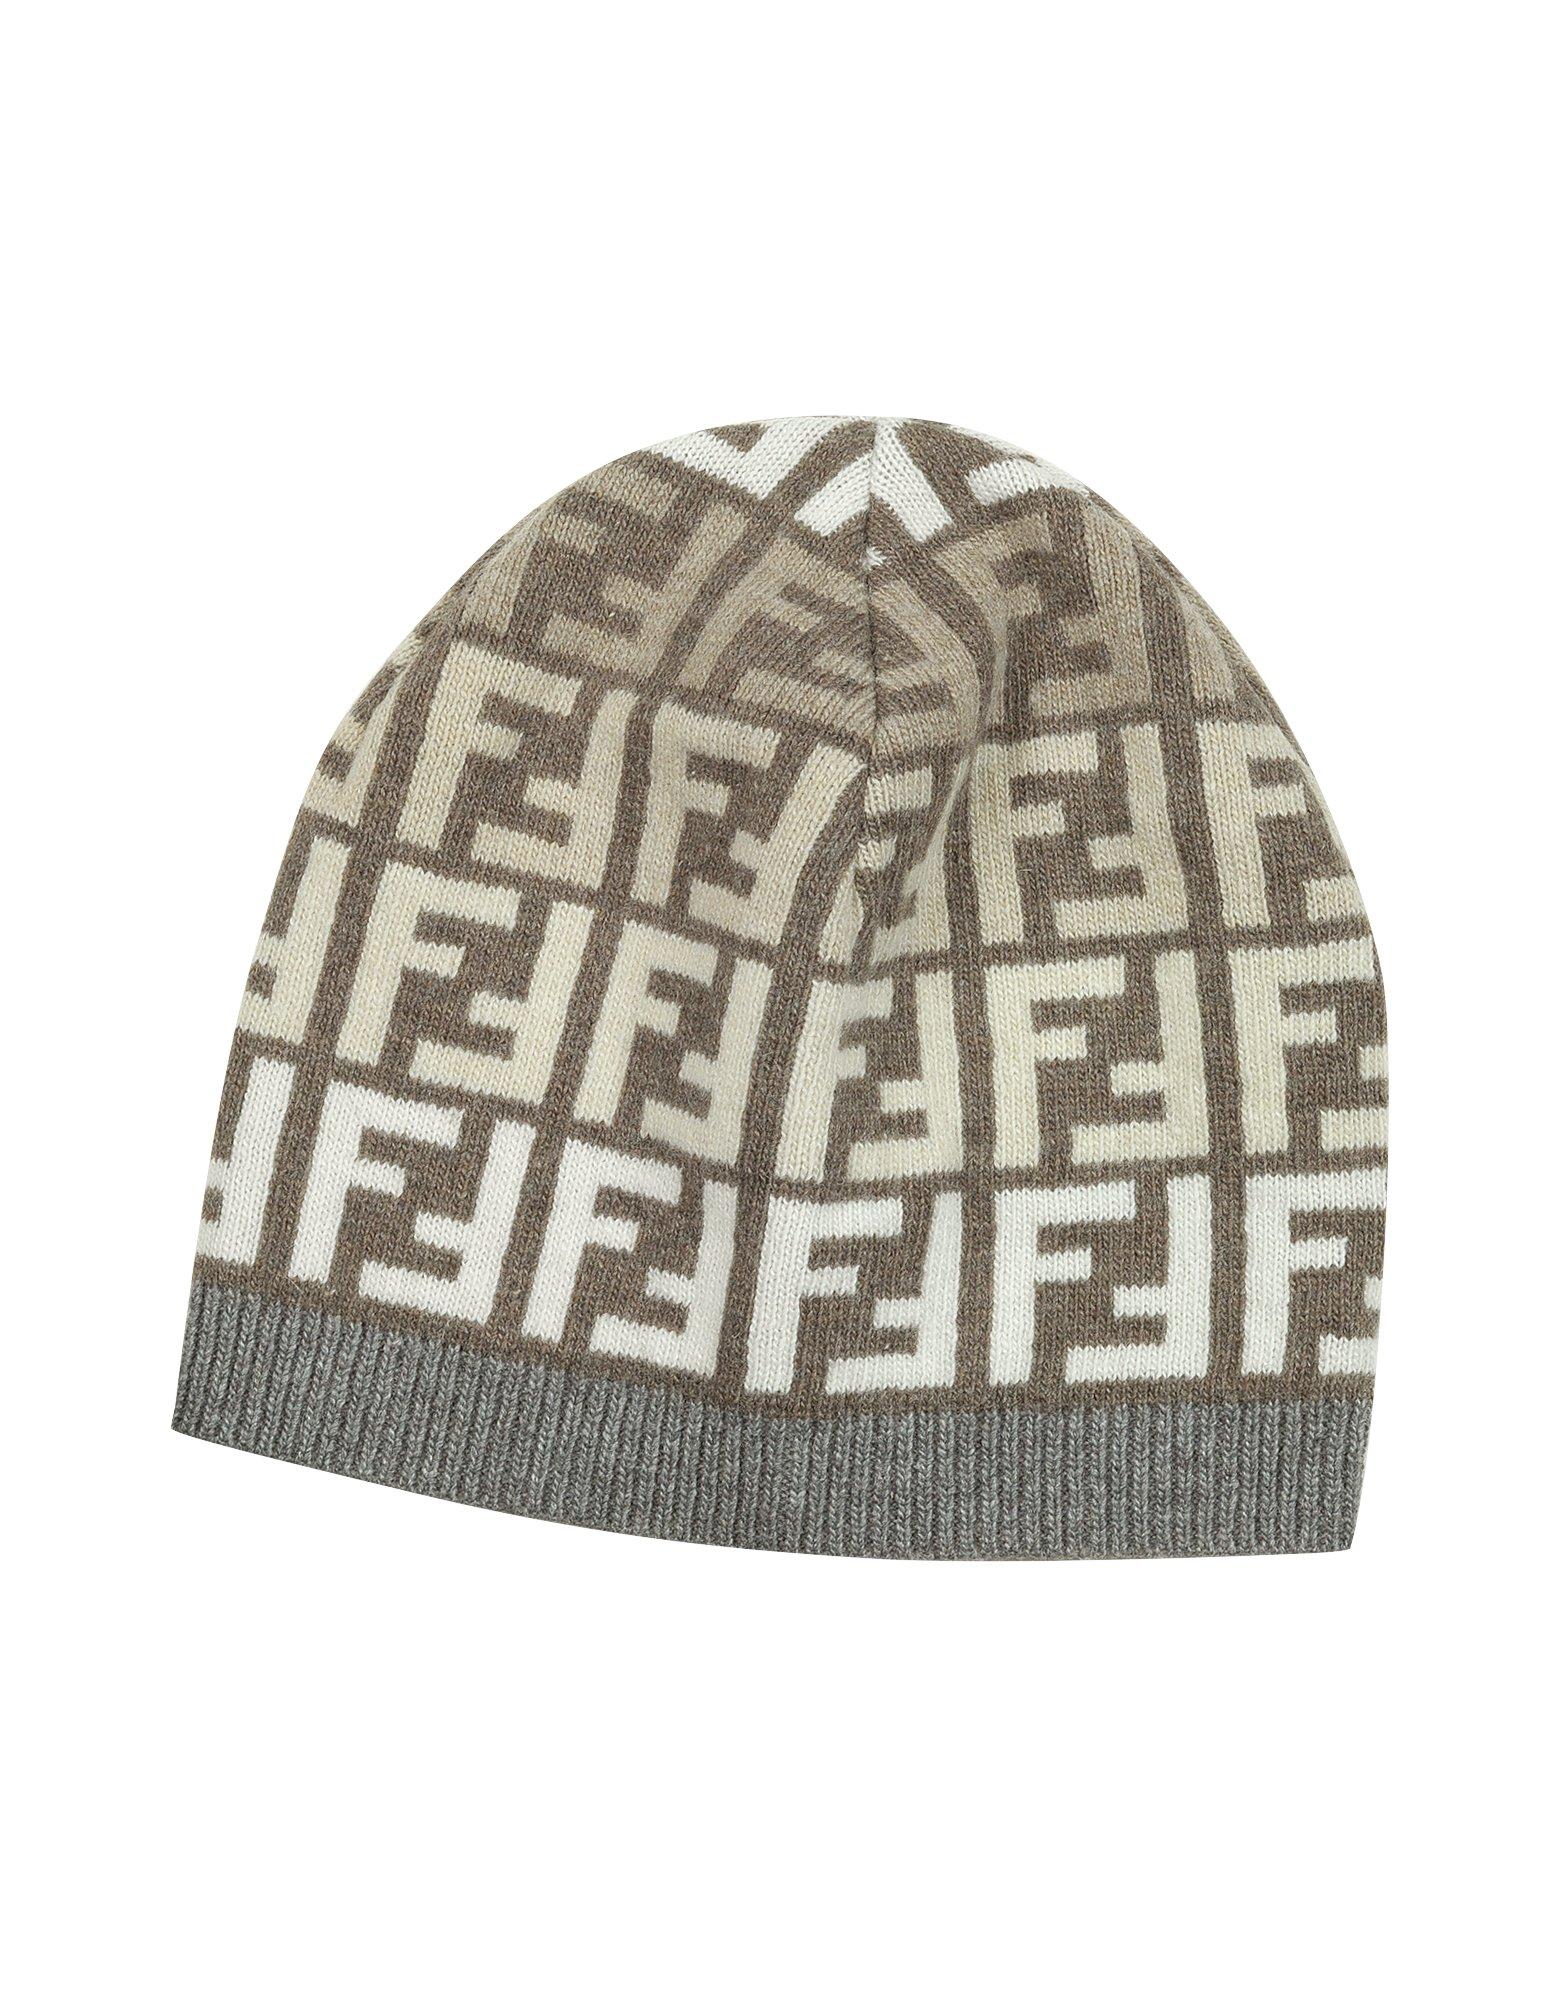 7ae355601e5 Lyst - Fendi Zucca Logo Skull Cap in Gray